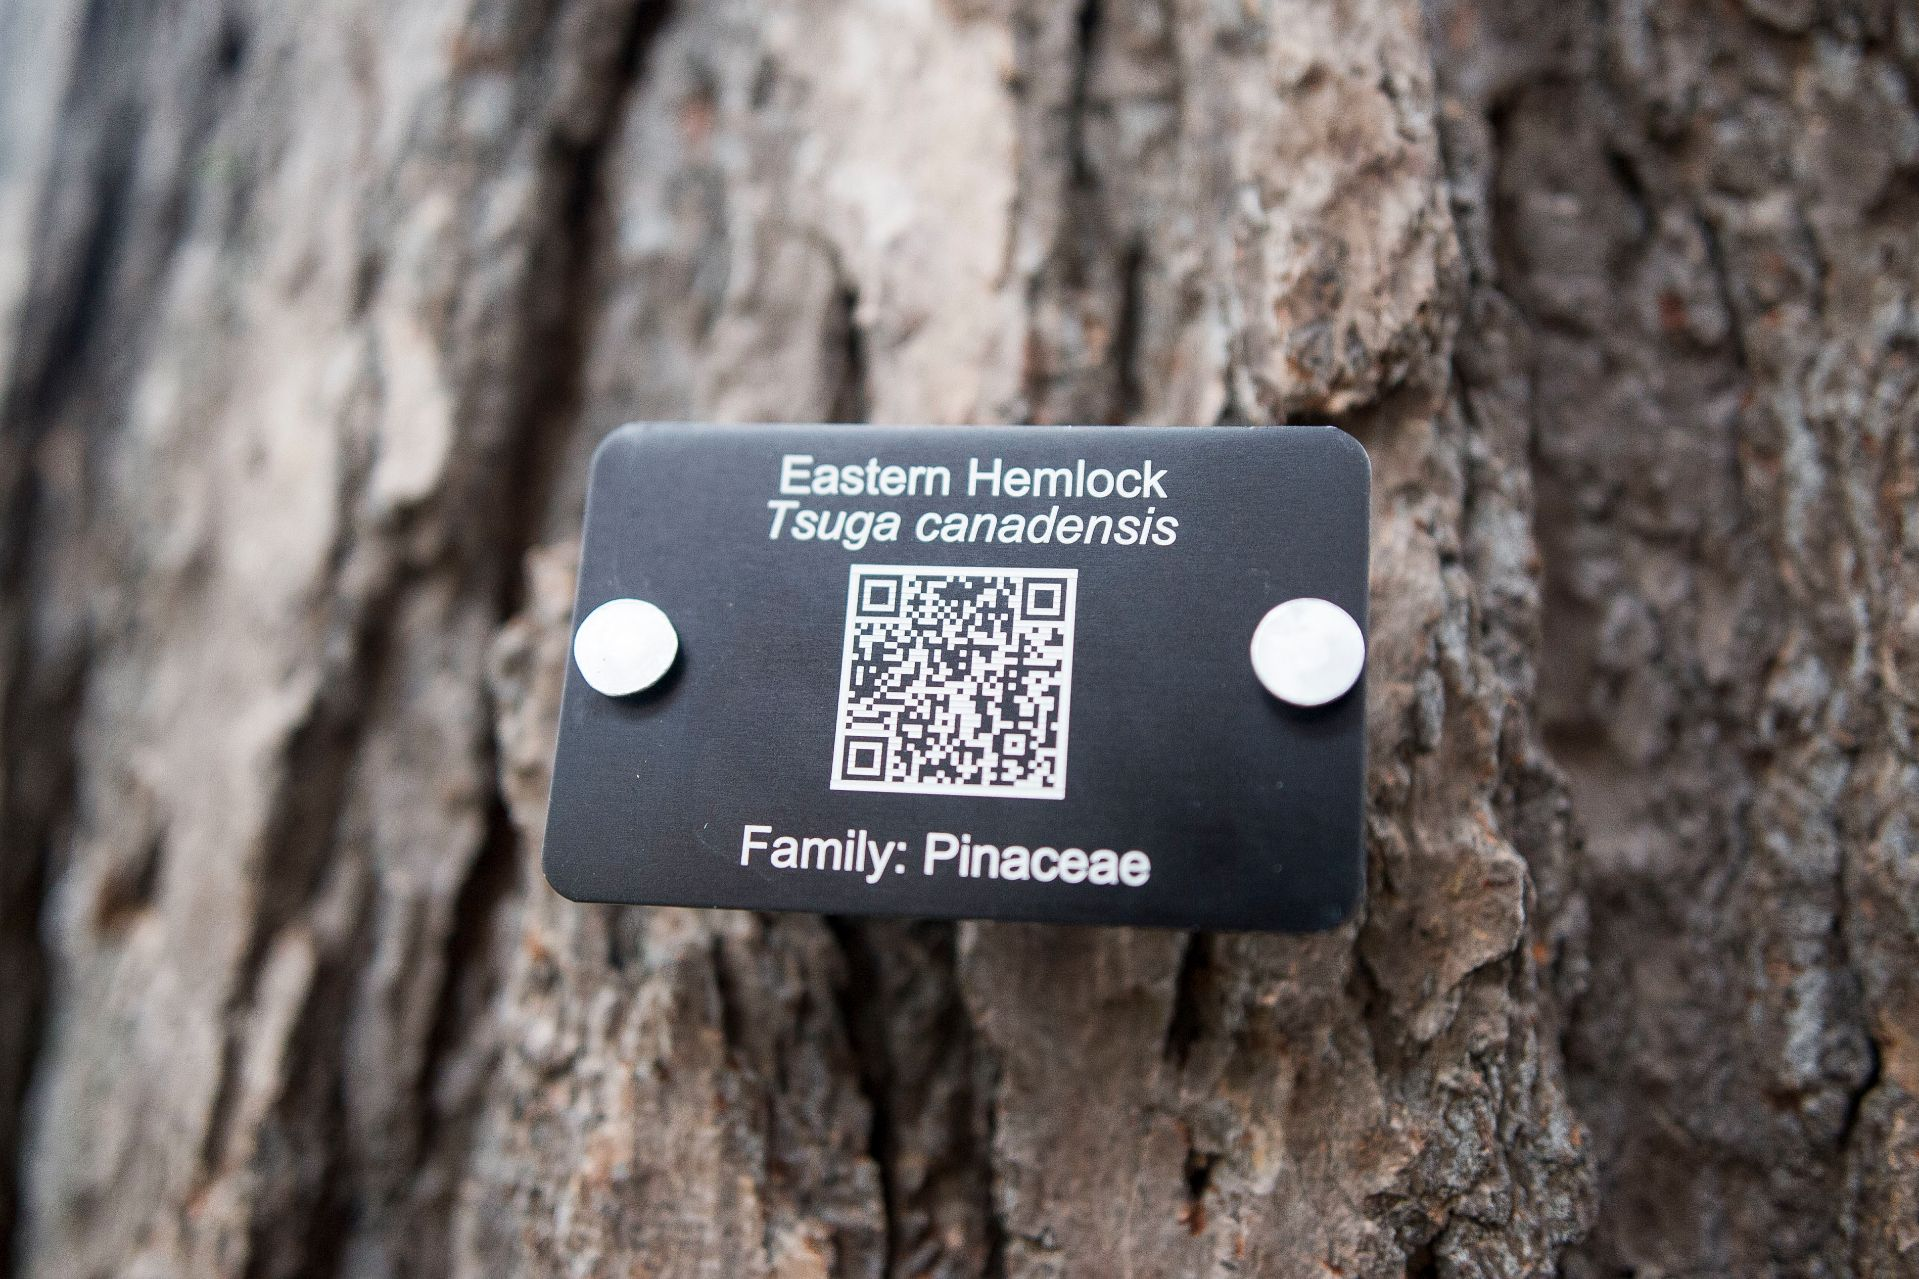 Qr Code Reader >> Tree Tags | Bates Canopy | Bates College